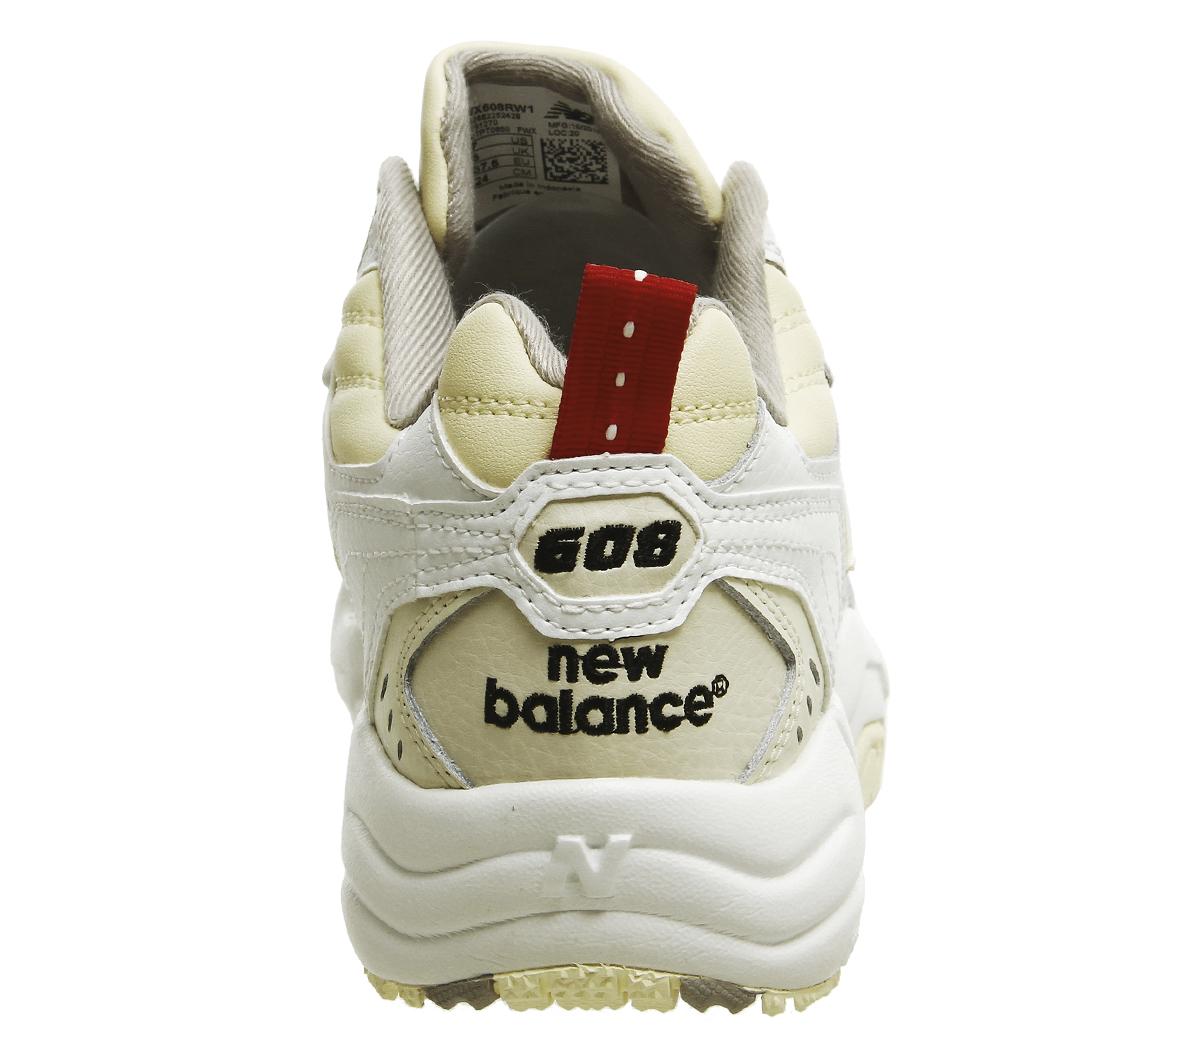 Damenschuhe New Balance 608 Trainers Weiß Cream Trainers Schuhes Schuhes Schuhes 6acd7e